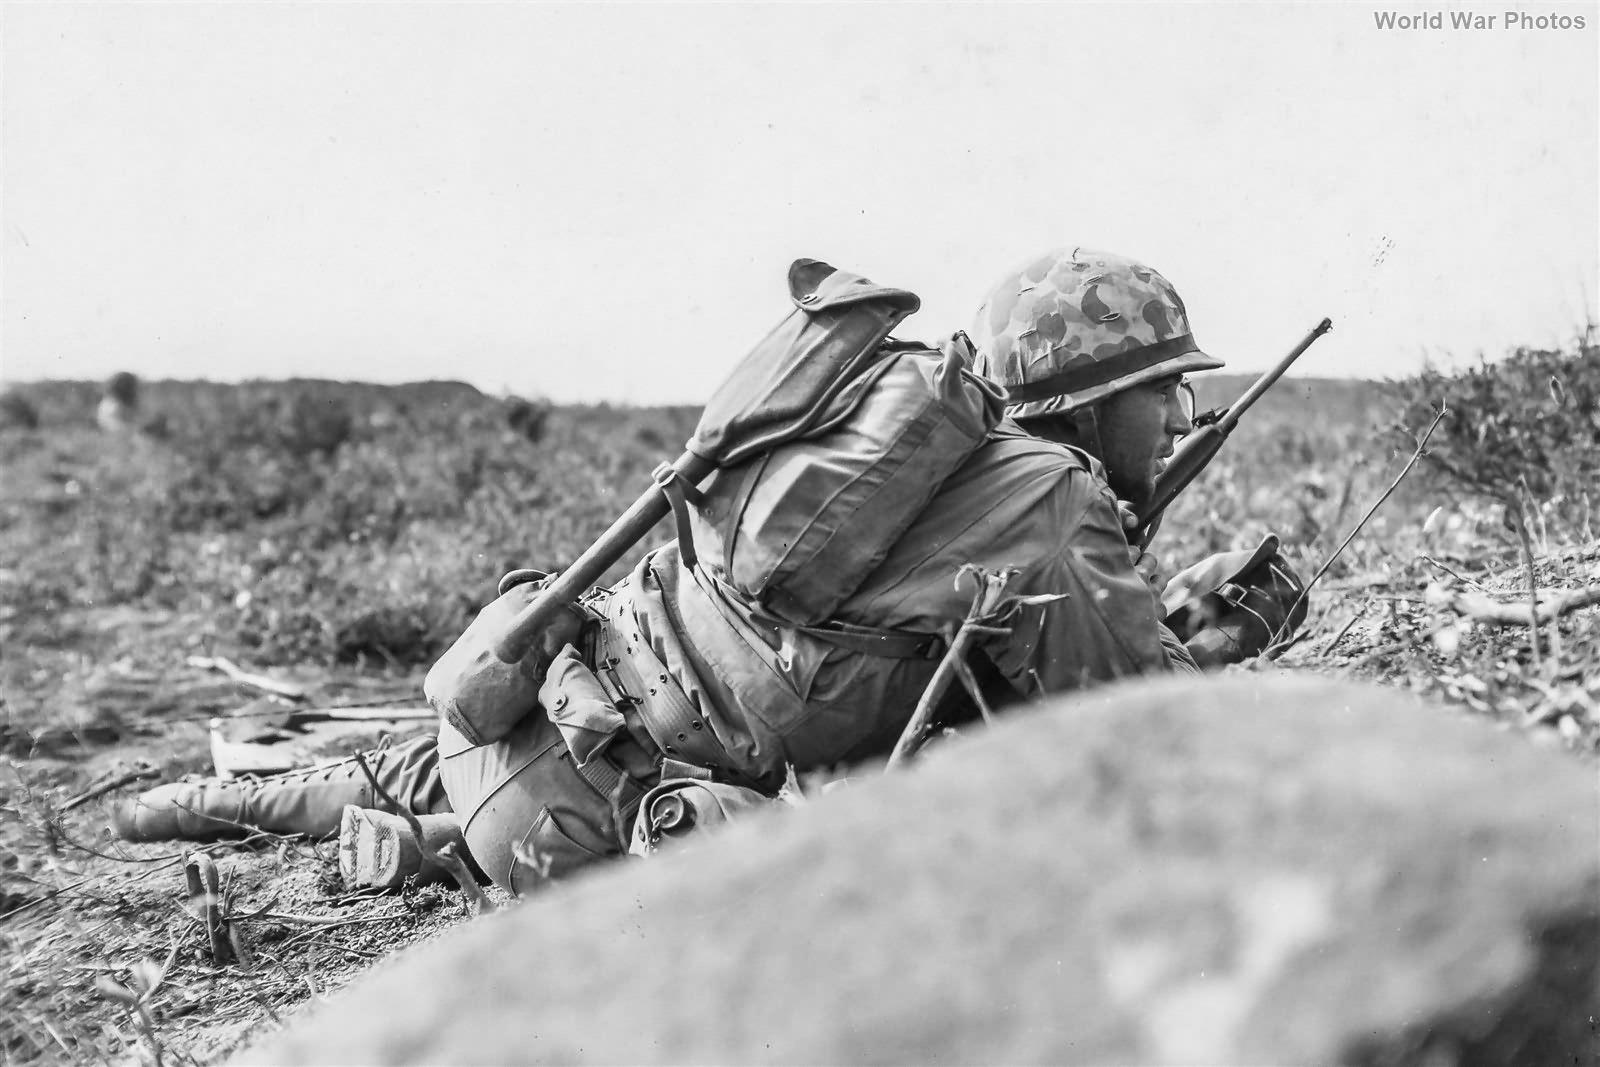 3/21 Marines crawling forward under fire at Airfield 2 Iwo Jima 24 February 1945